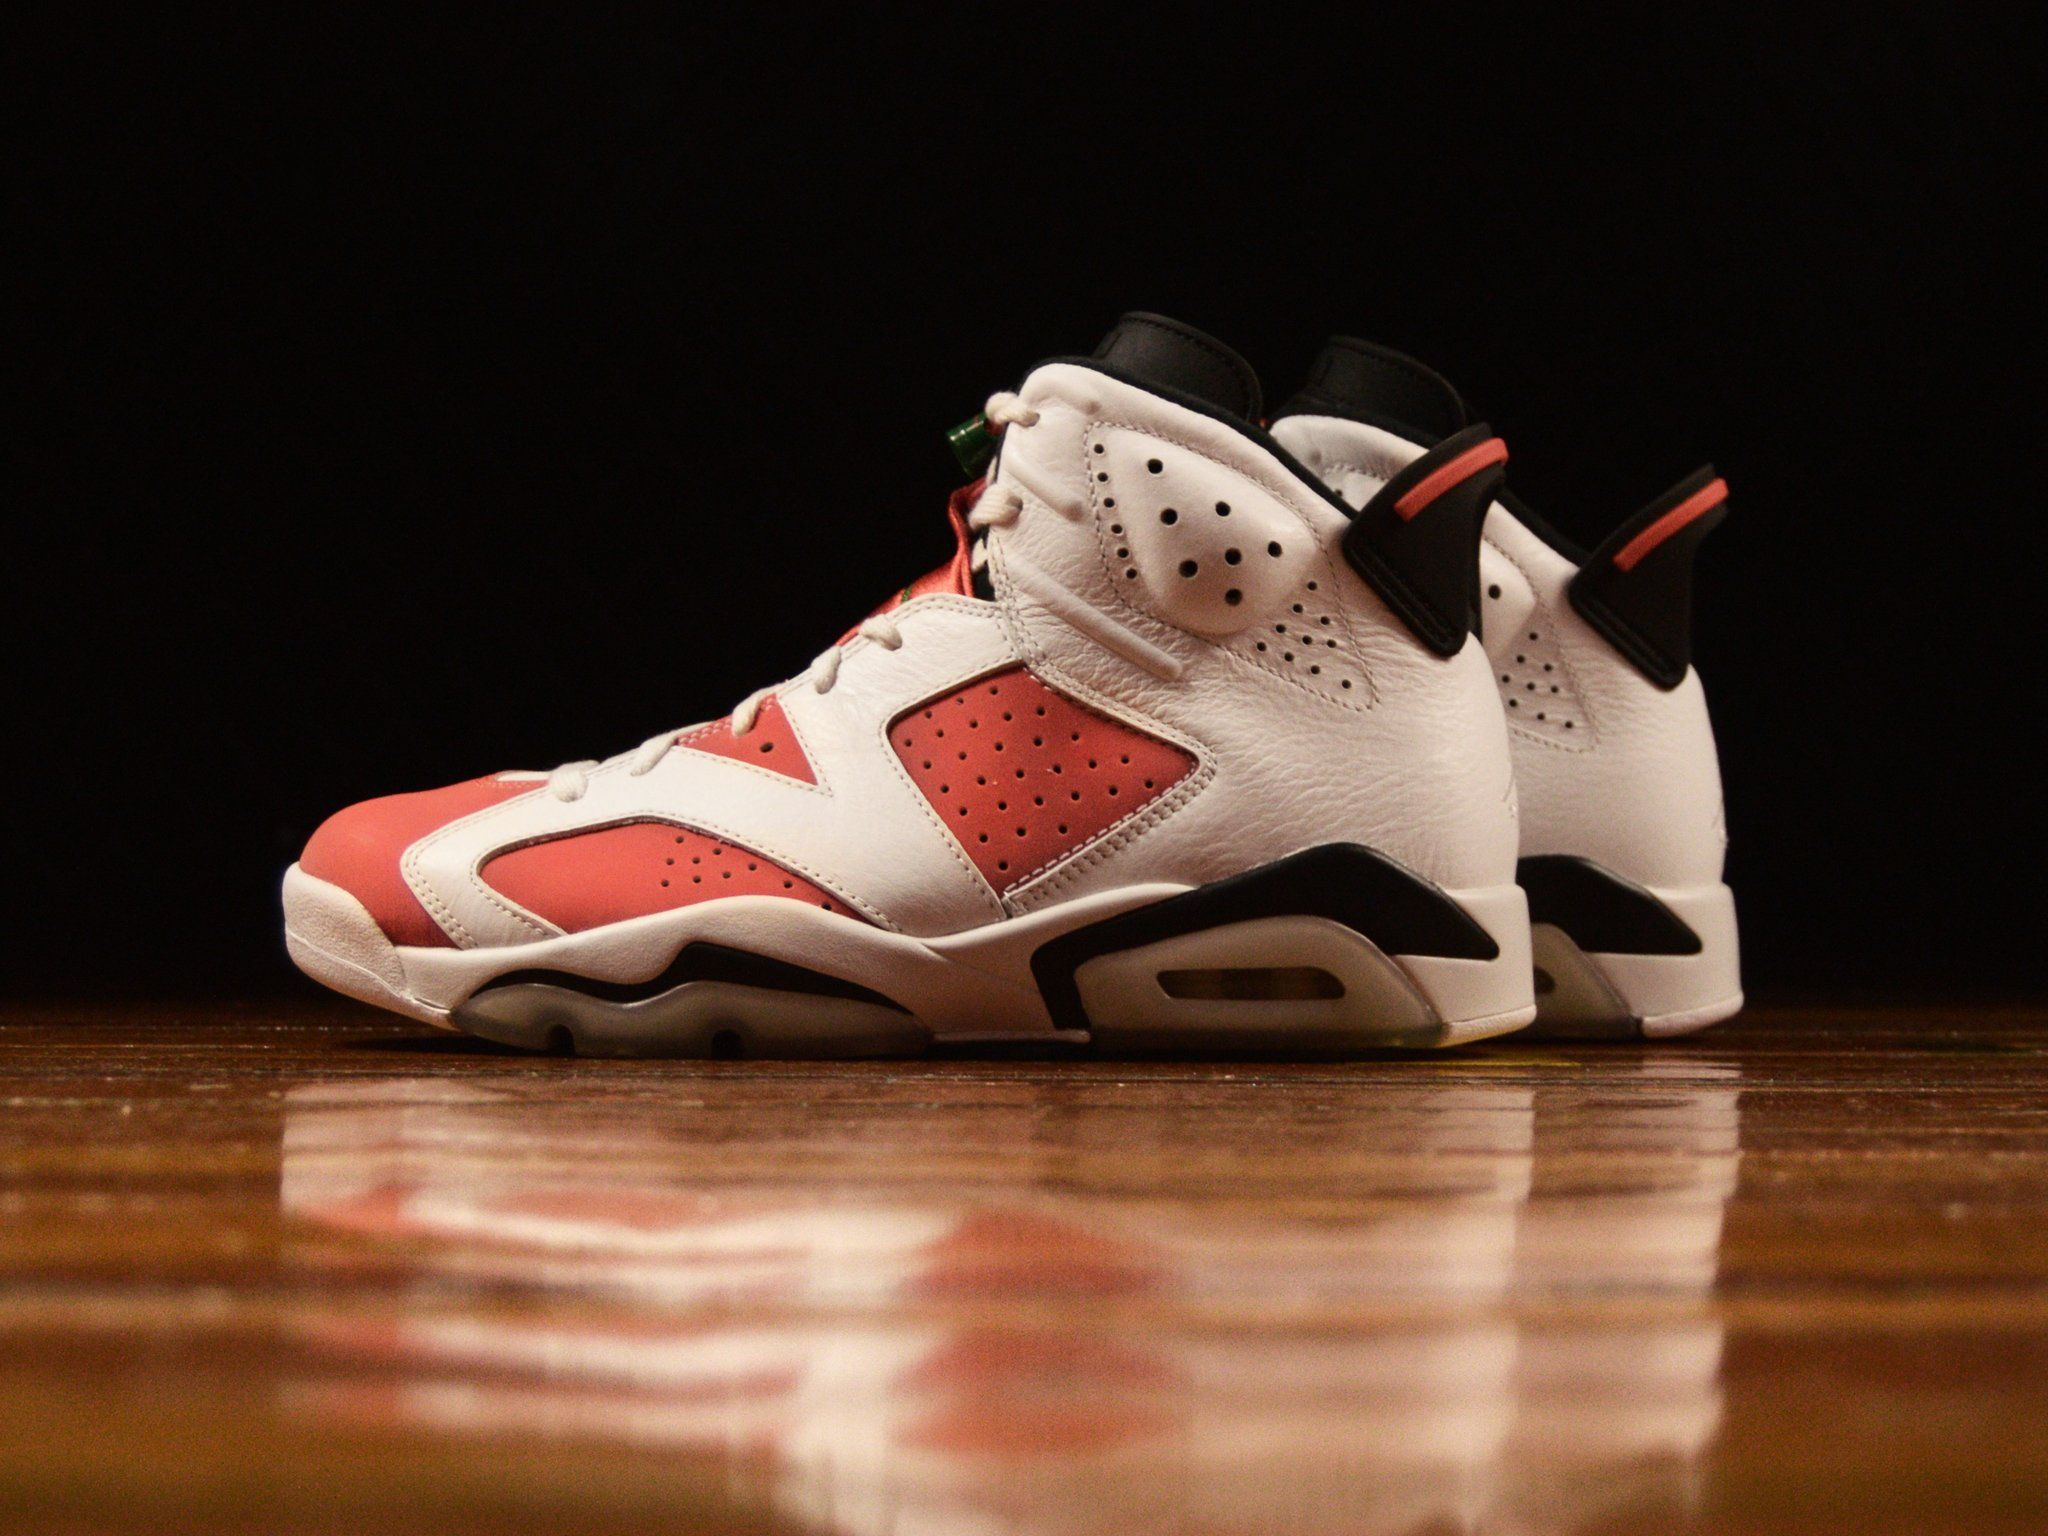 bcc8950eb8f Men's Air Jordan 6 Retro 'Like Mike' [384664-145]   Air Jordan   Air ...